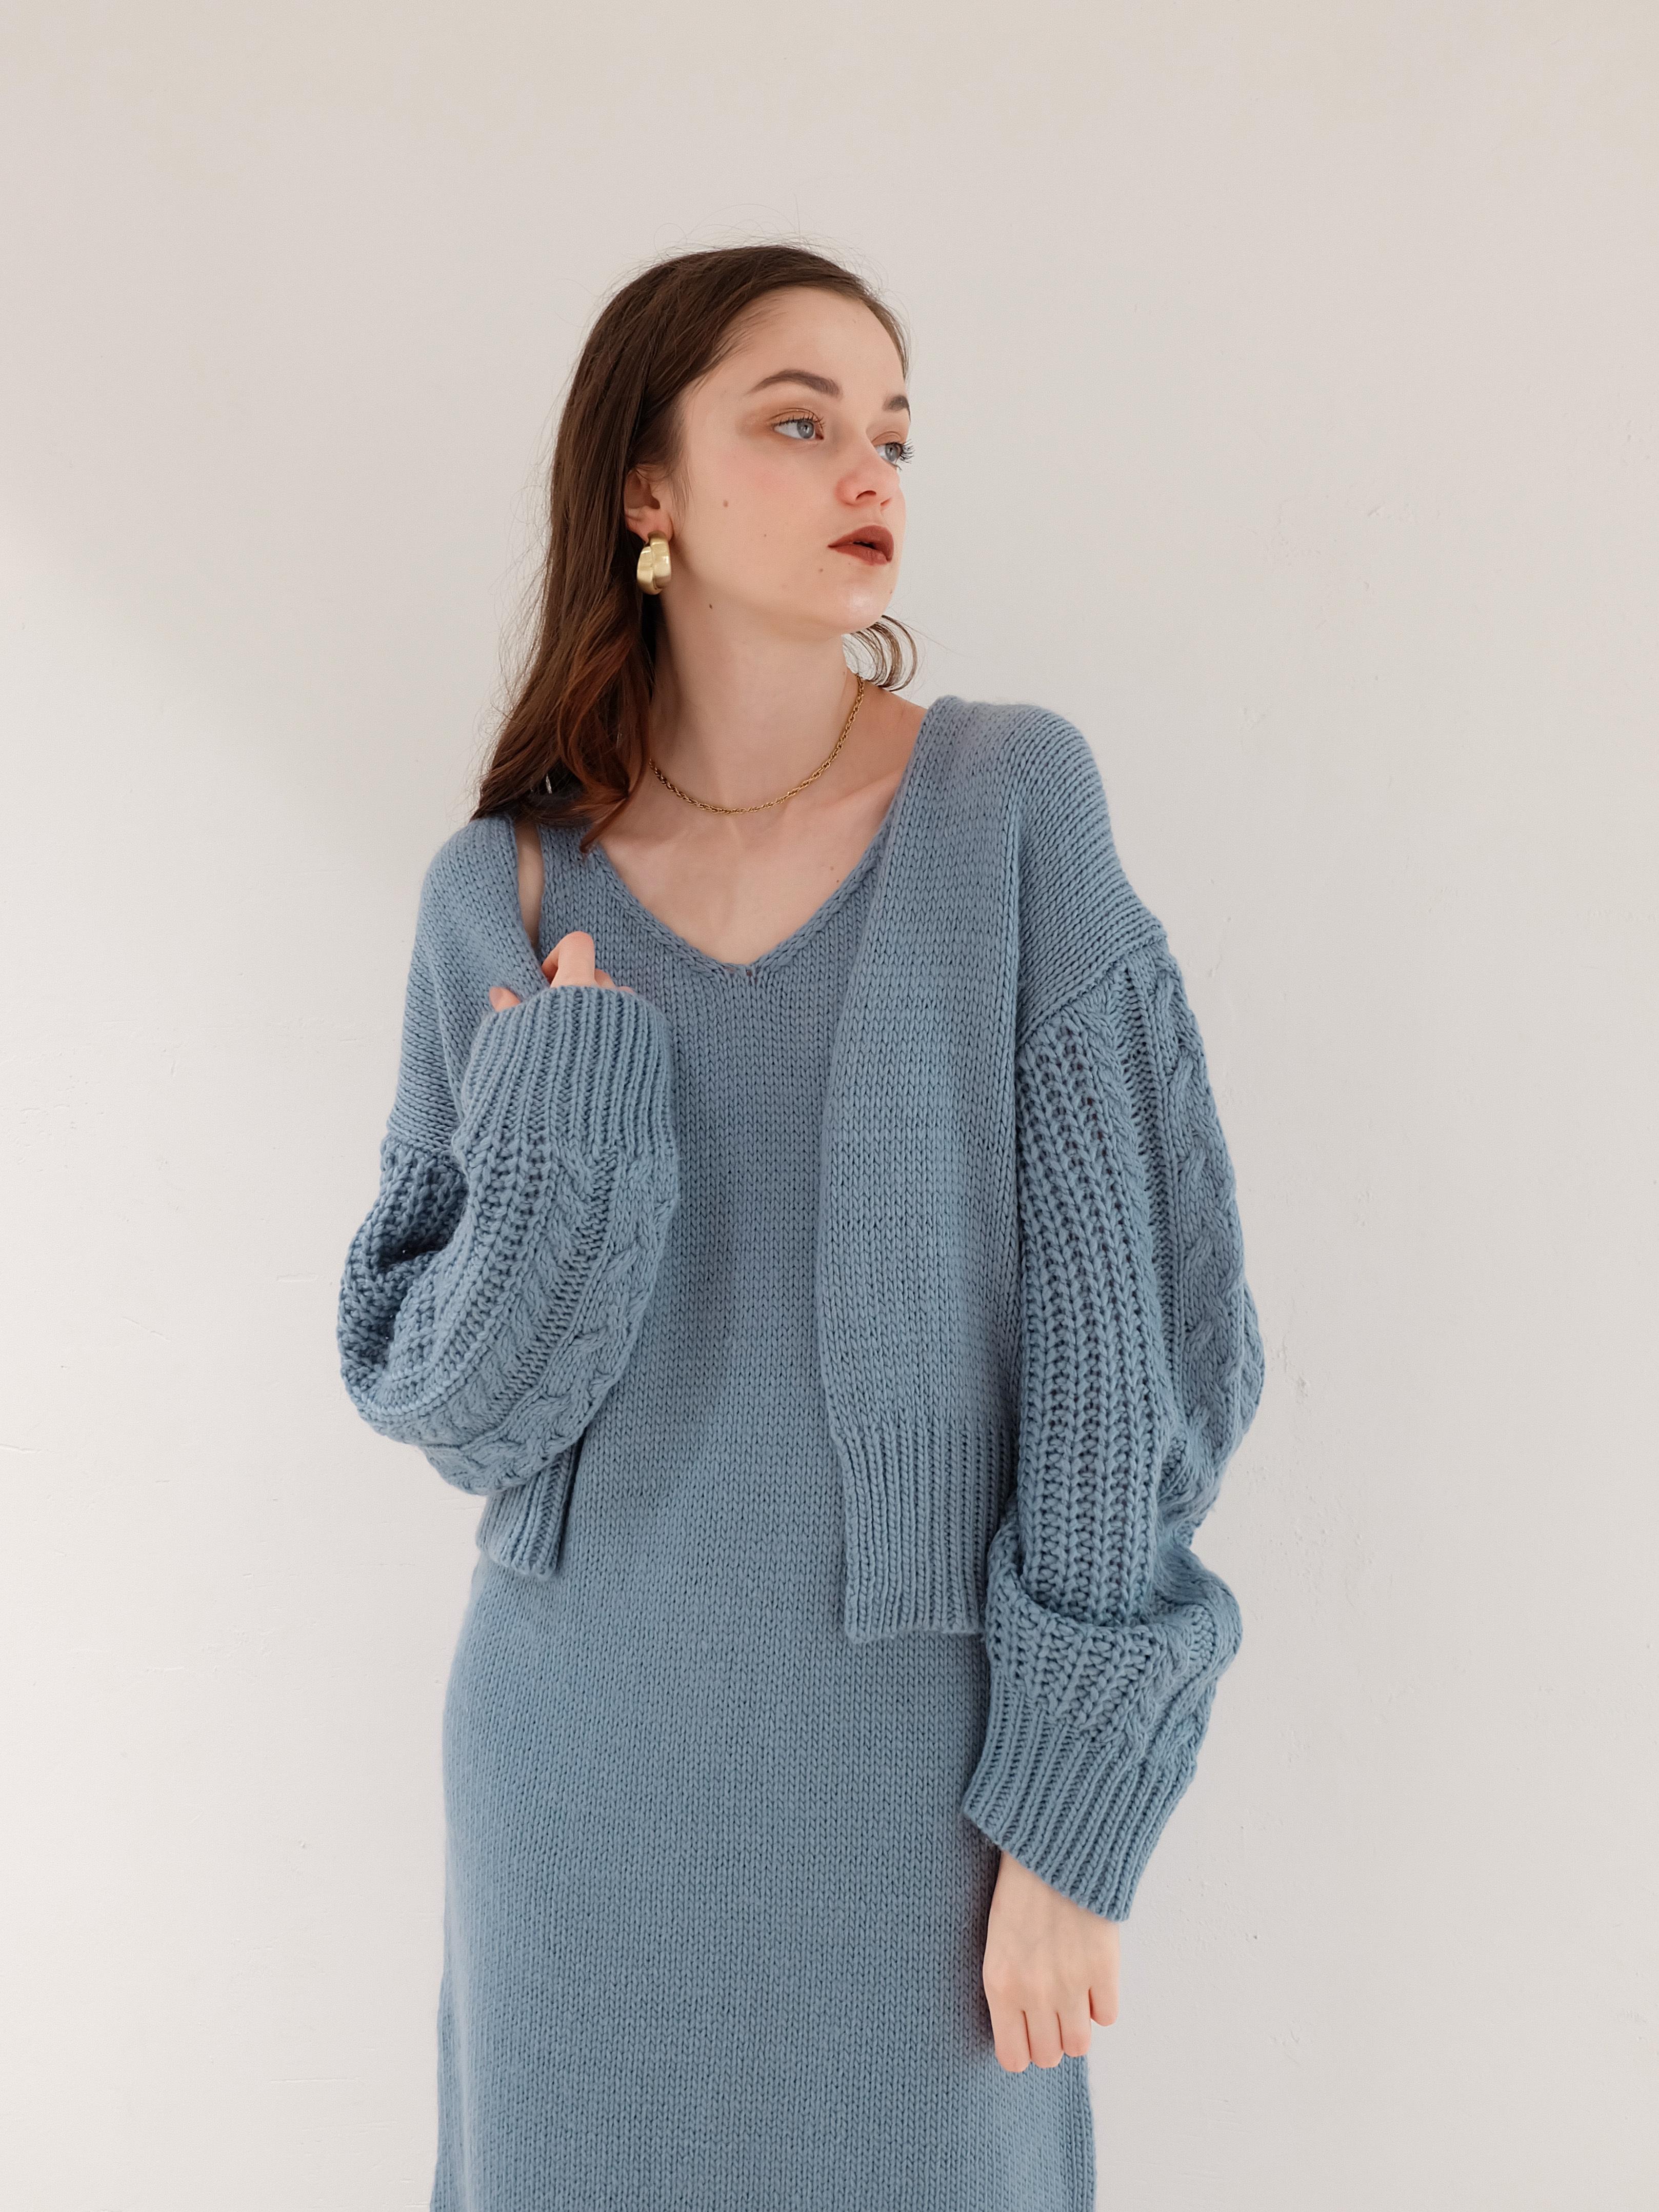 knit cardigan one-piece setup(blue)